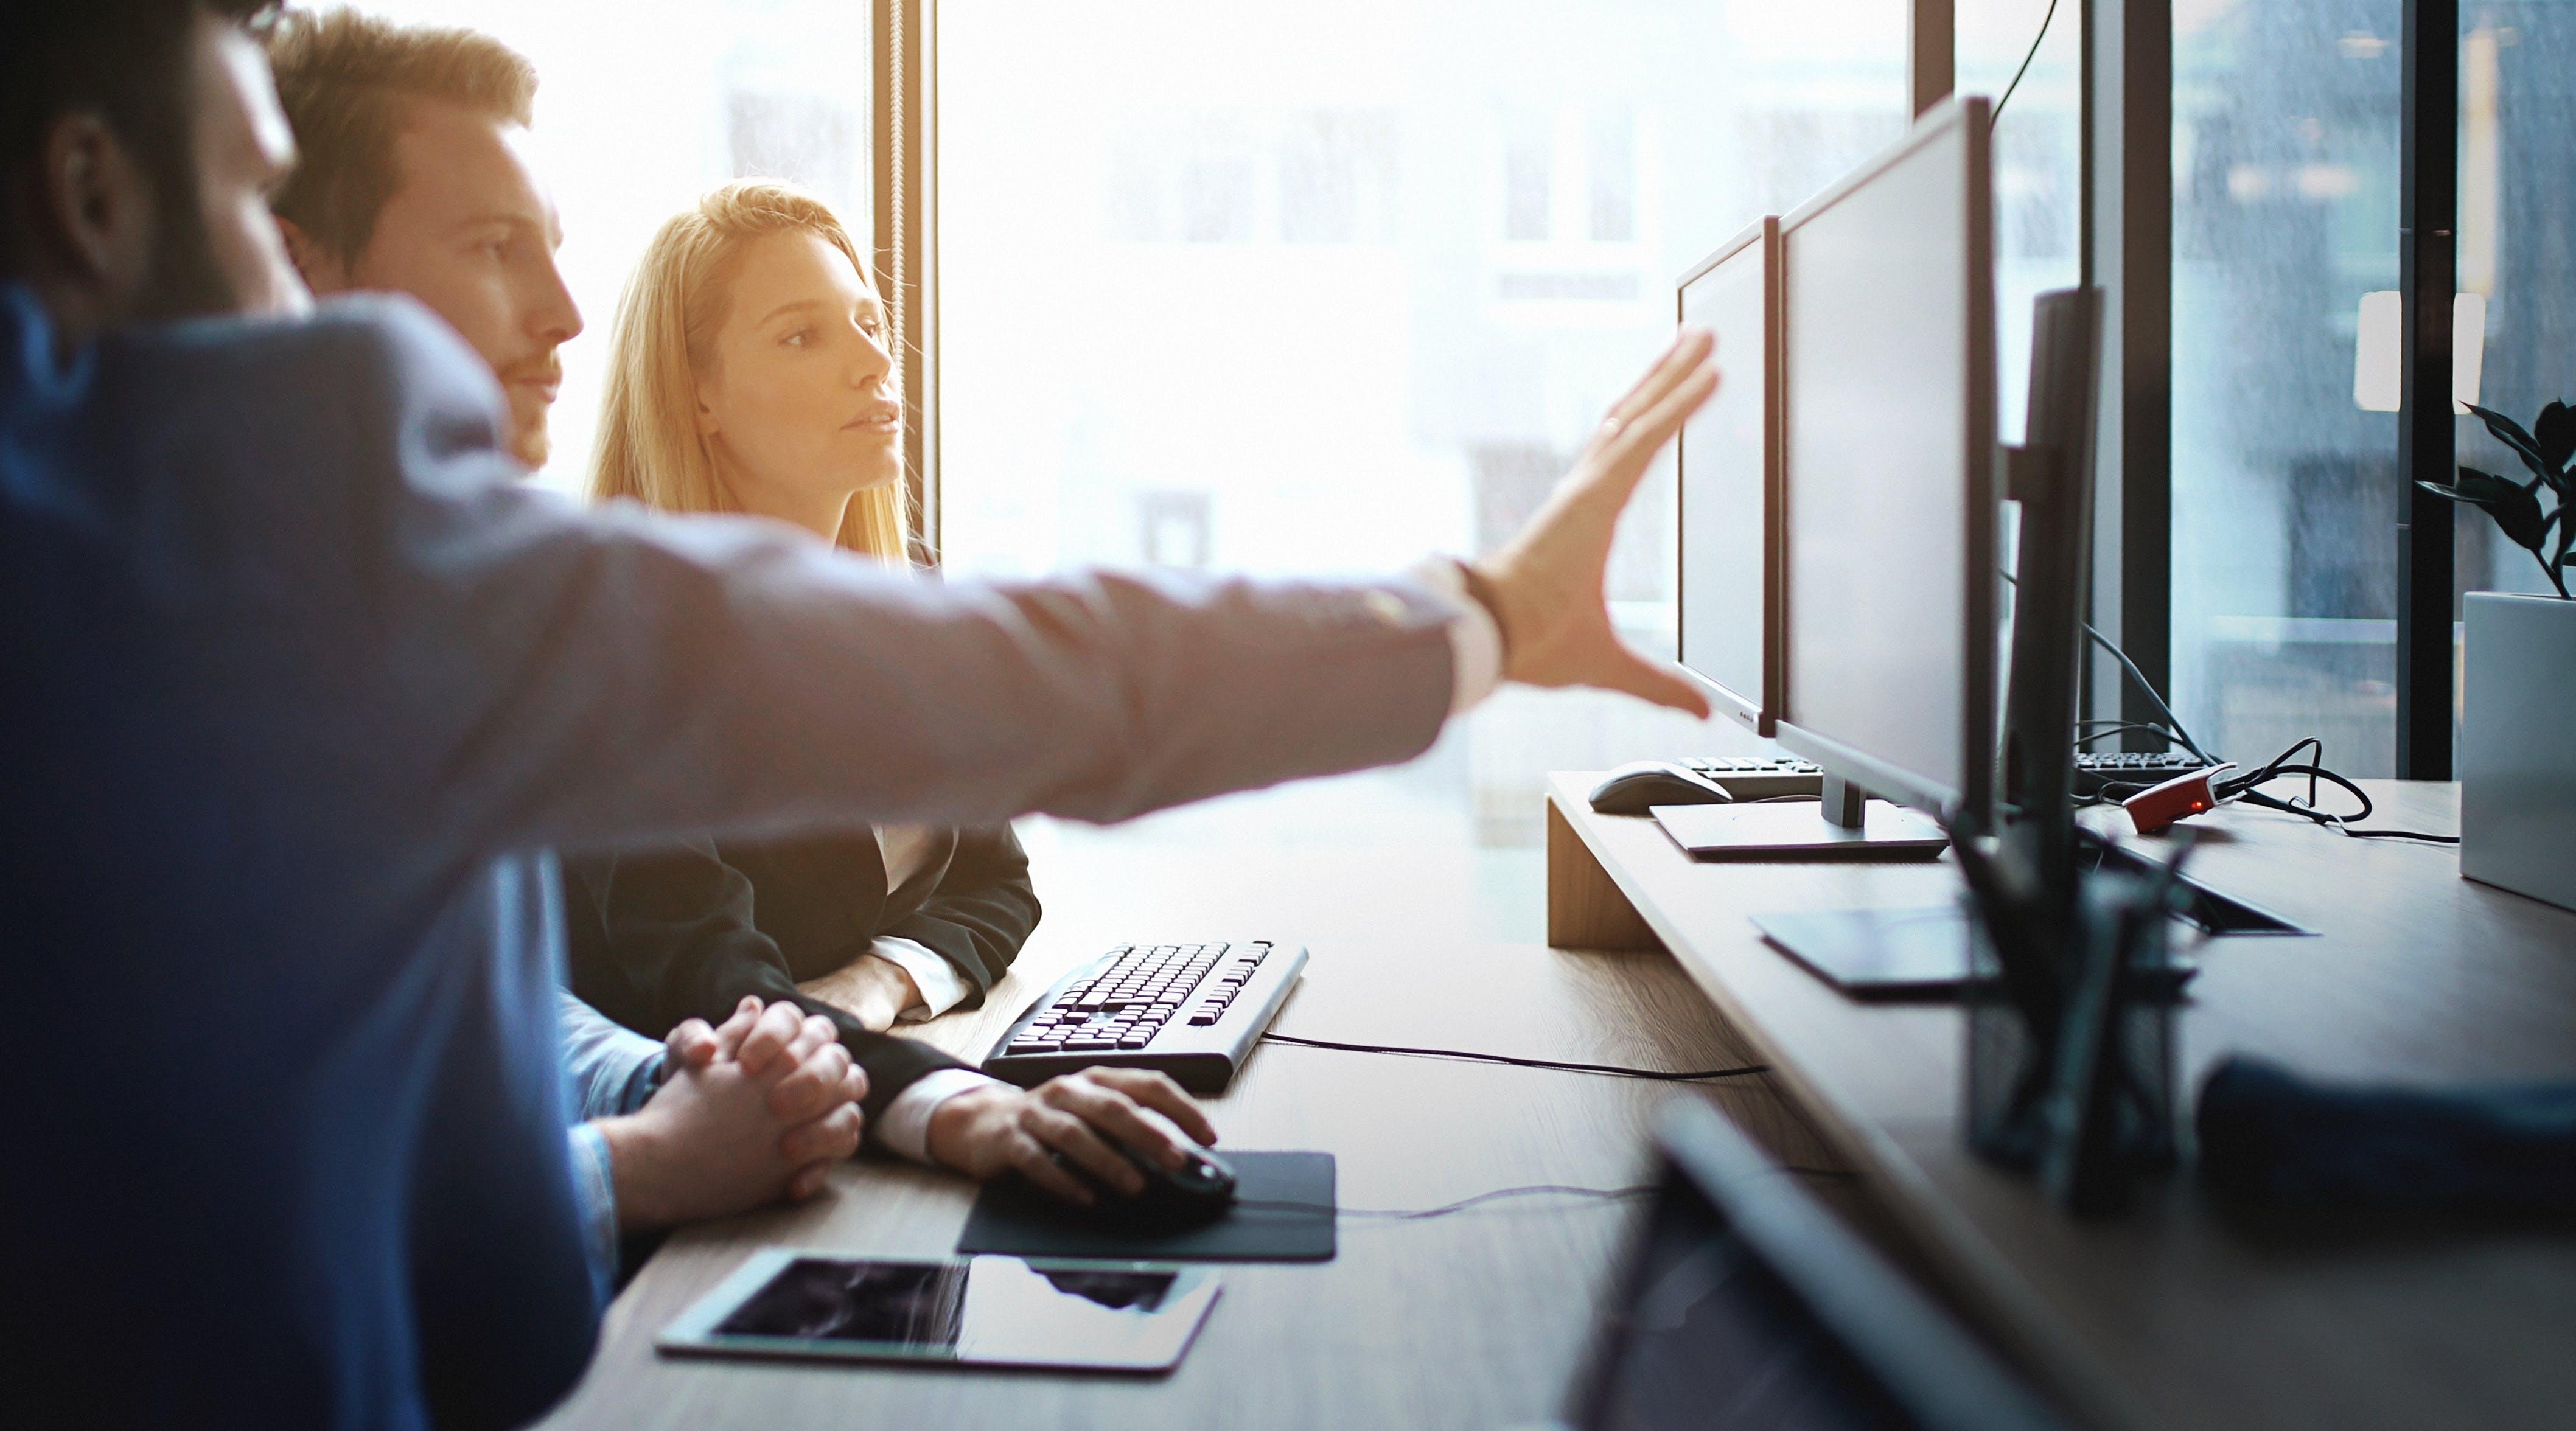 Titelbild-Laptop-Meeting-Team-iStock-636609180-Bildnachweis-gilaxia-e1504002112155